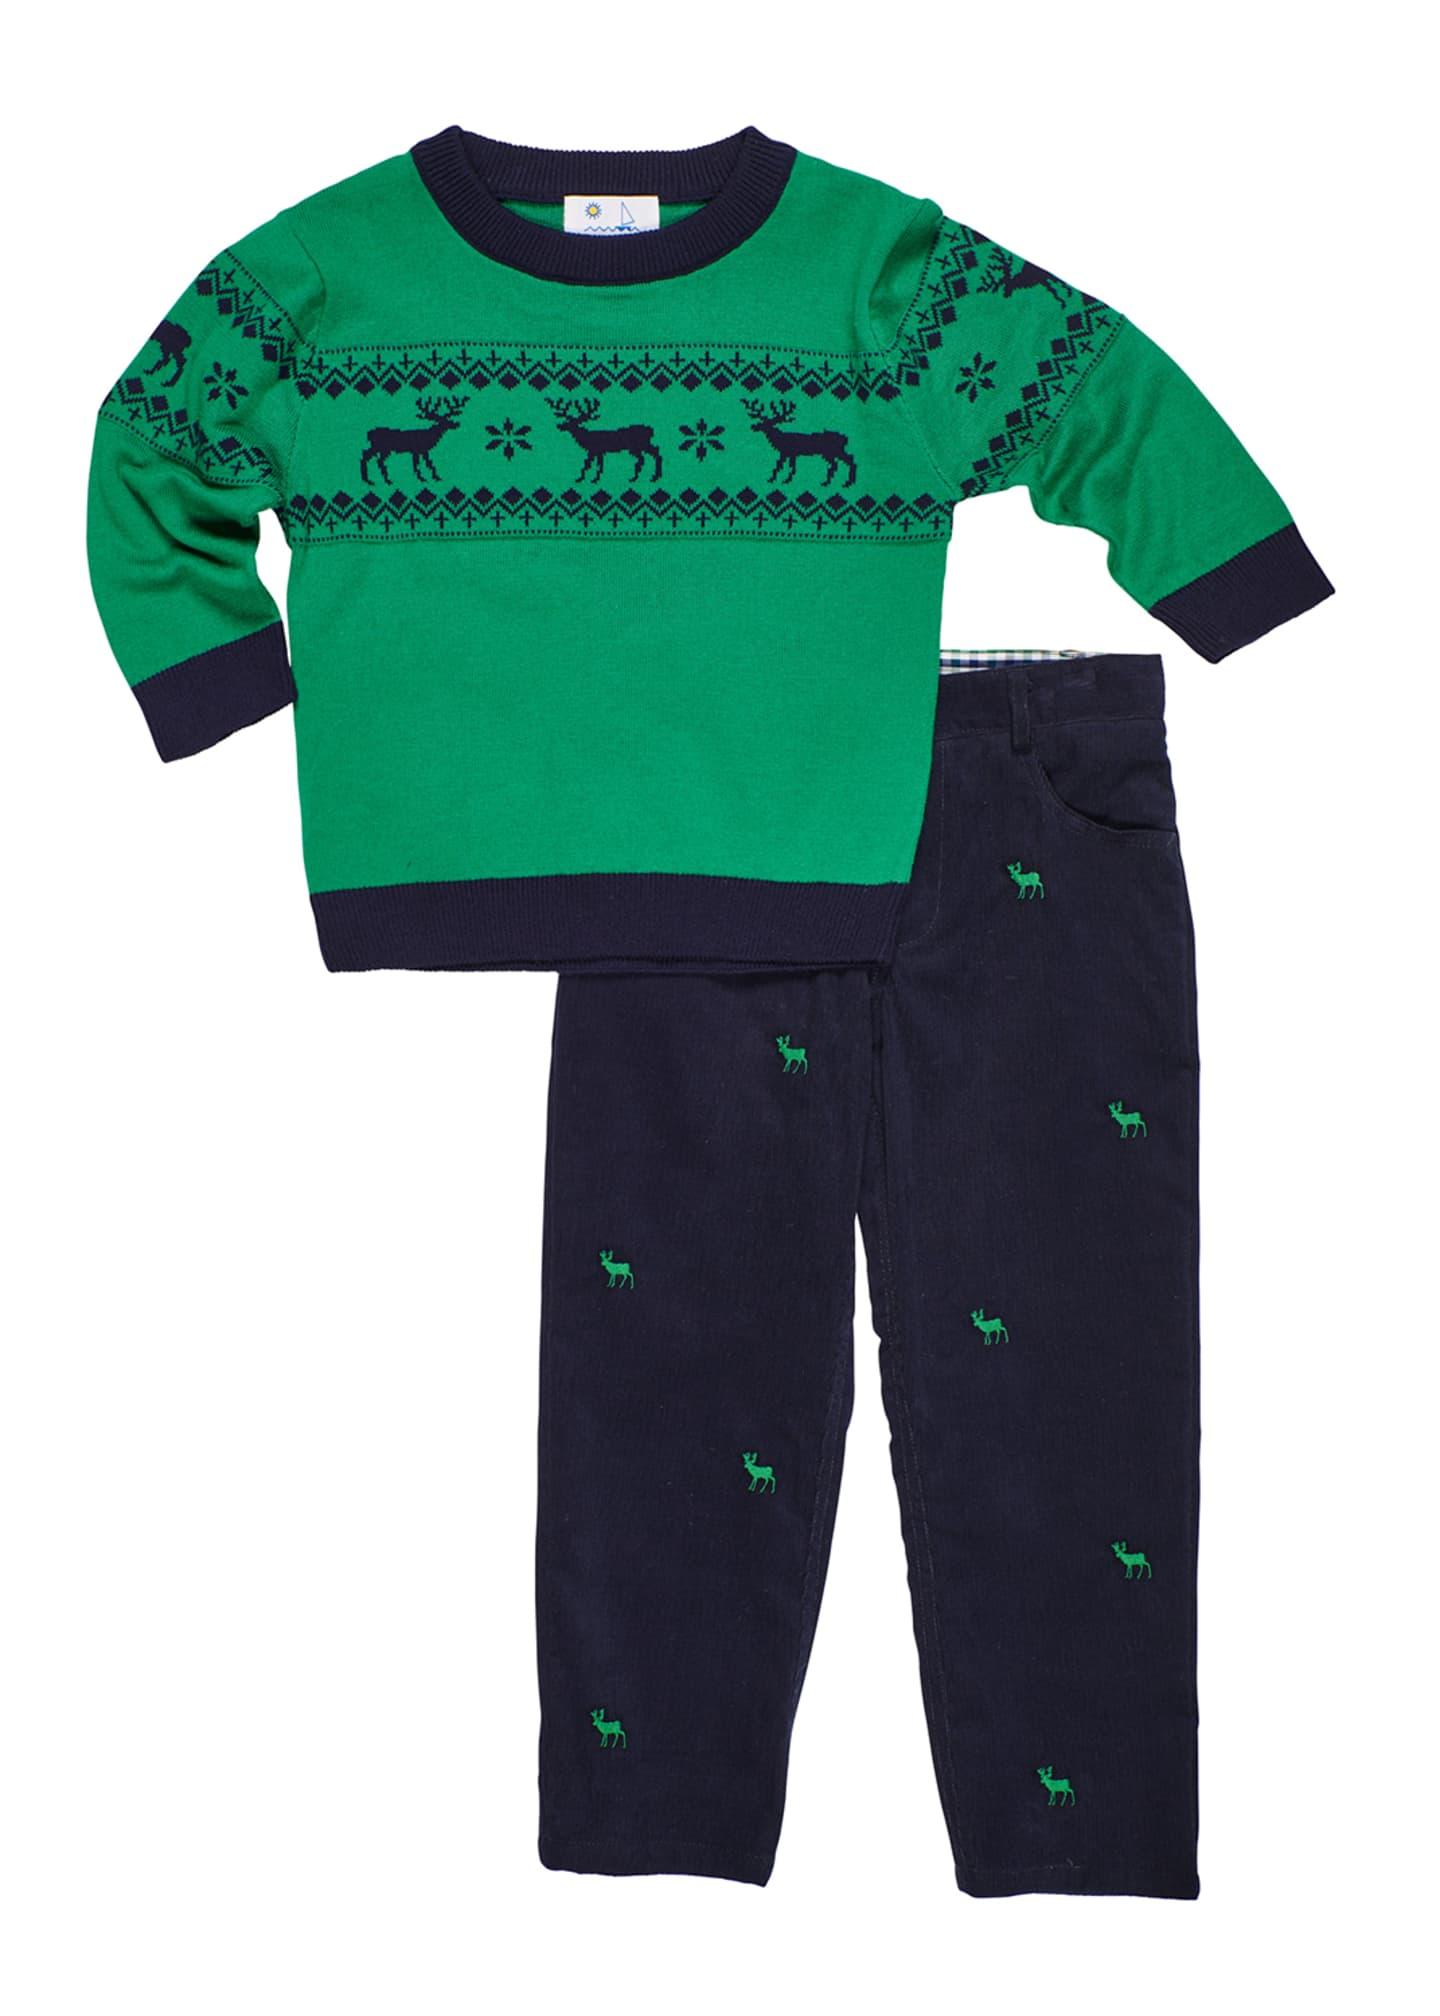 Florence Eiseman Boy's Reindeer Knit Sweater w/ Matching